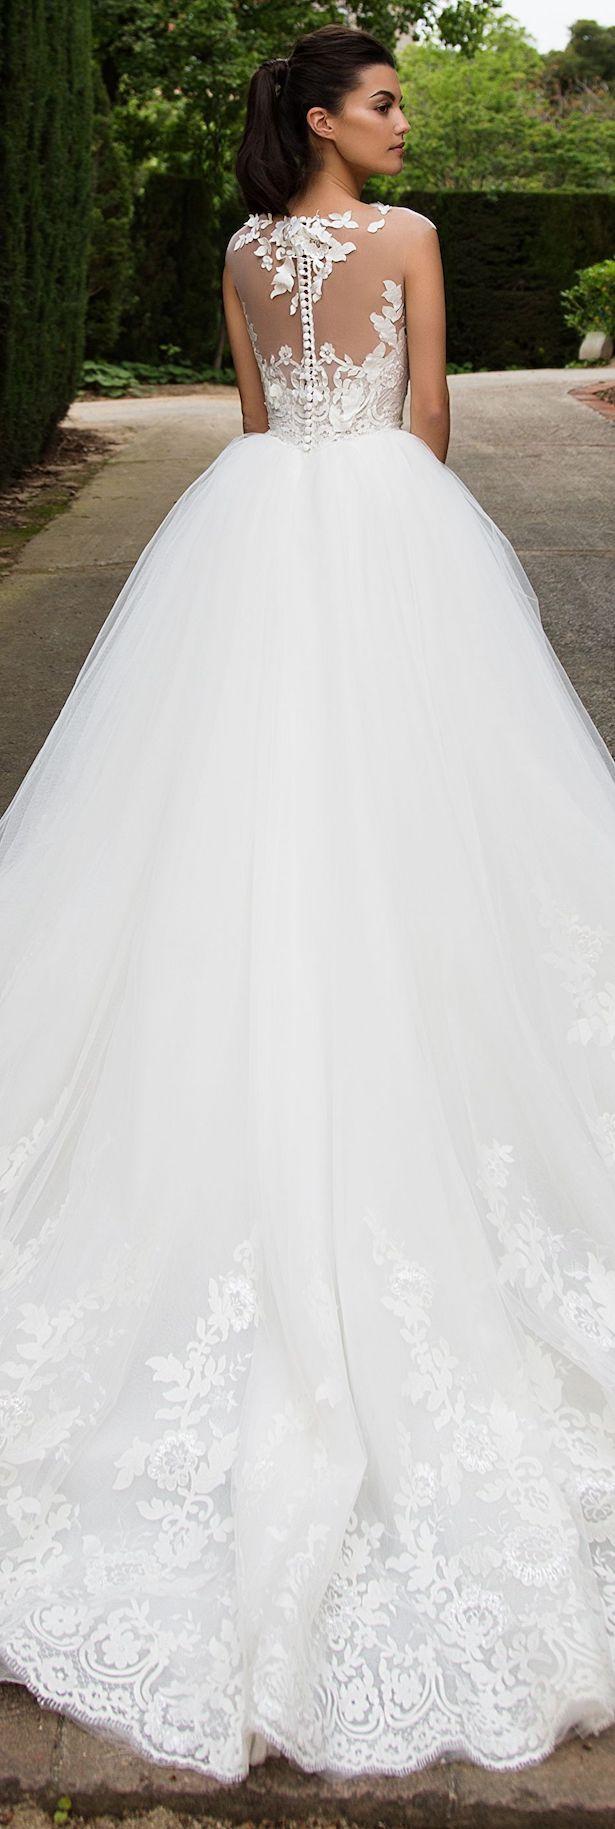 Wedding Dress by Milla Nova White Desire 2017 Bridal Collection - Norina